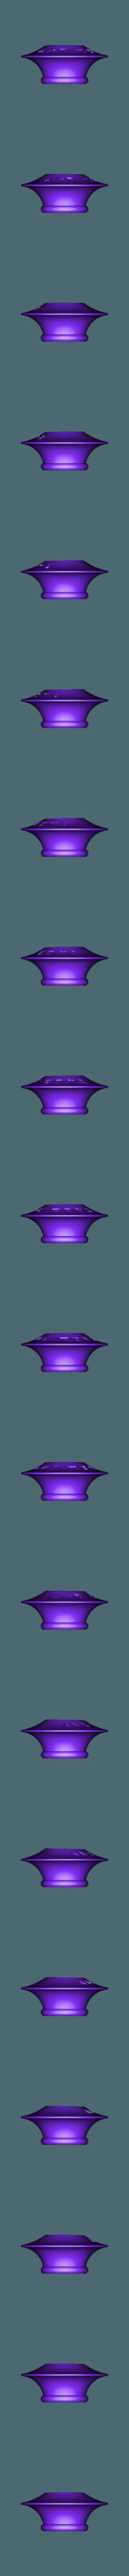 stand.stl Download free STL file Klingon Bat'leth trophy • 3D printer template, poblocki1982